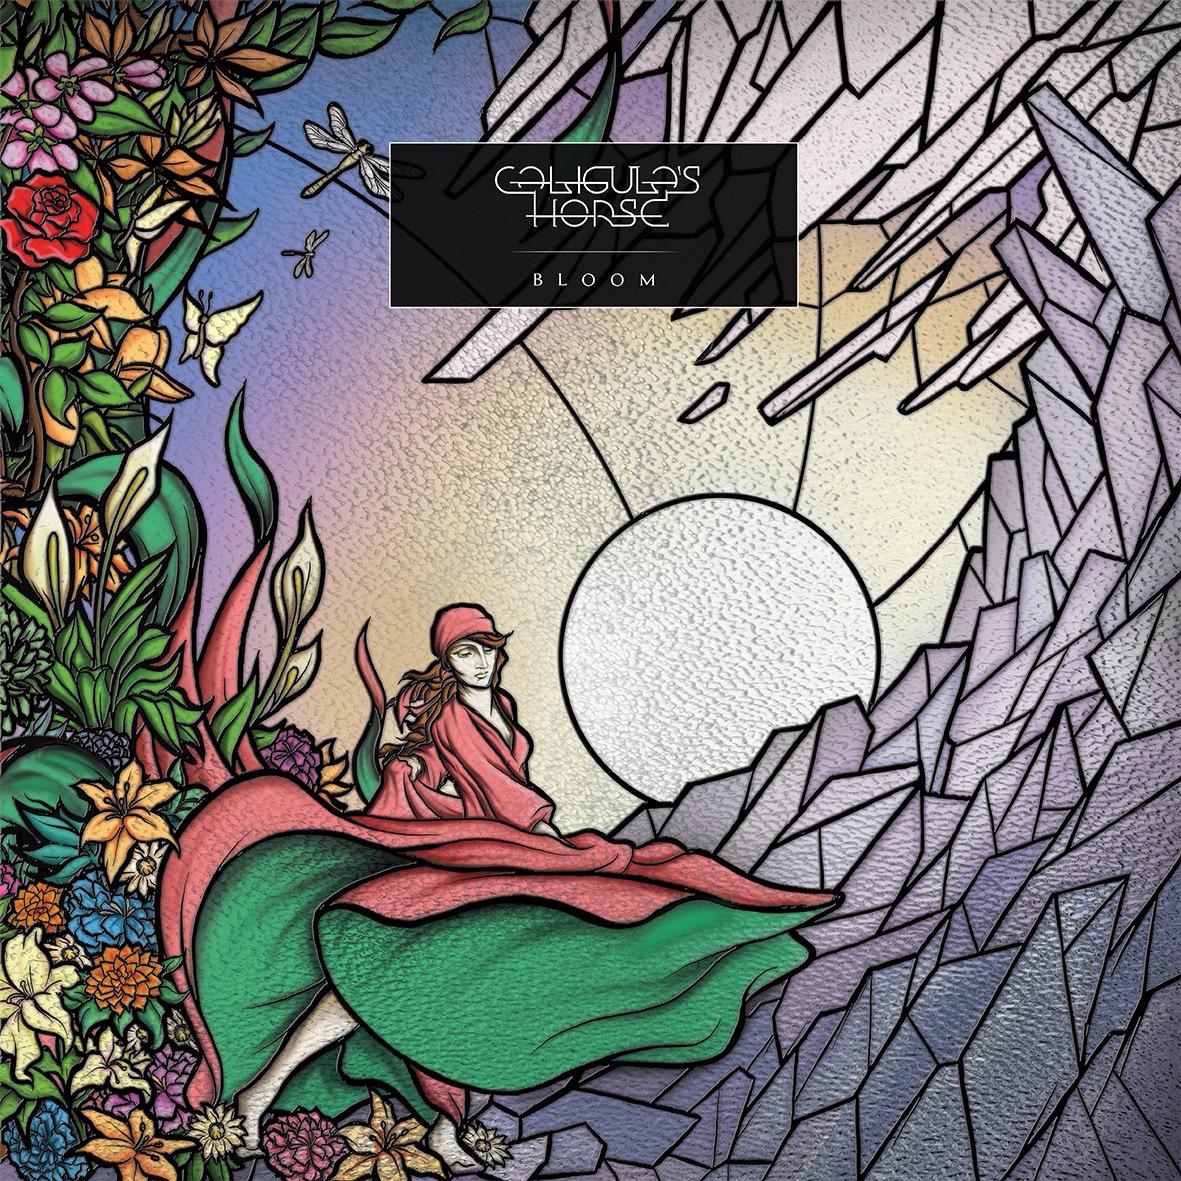 caligulas-horse-bloom-cover.jpg